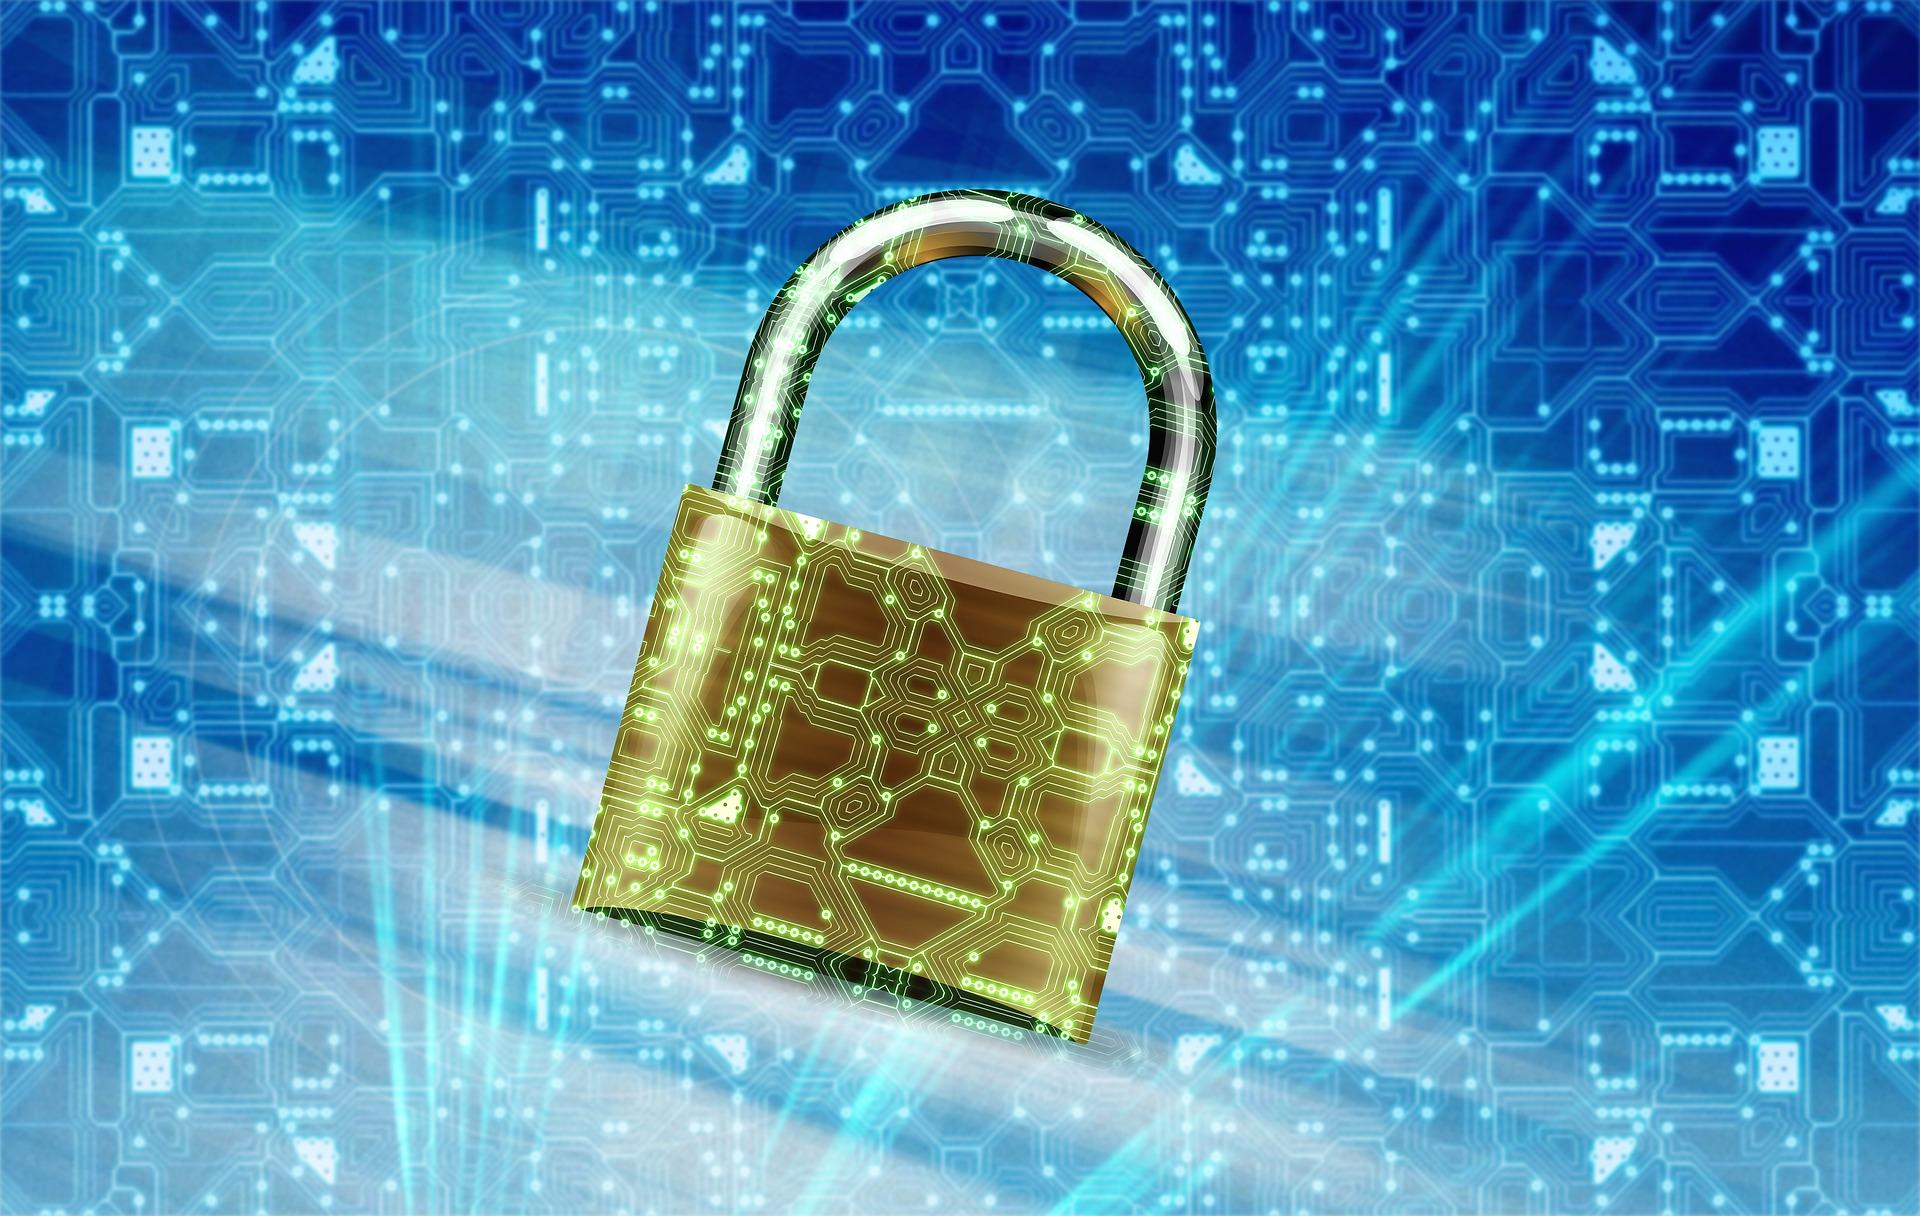 security 2168233_1920